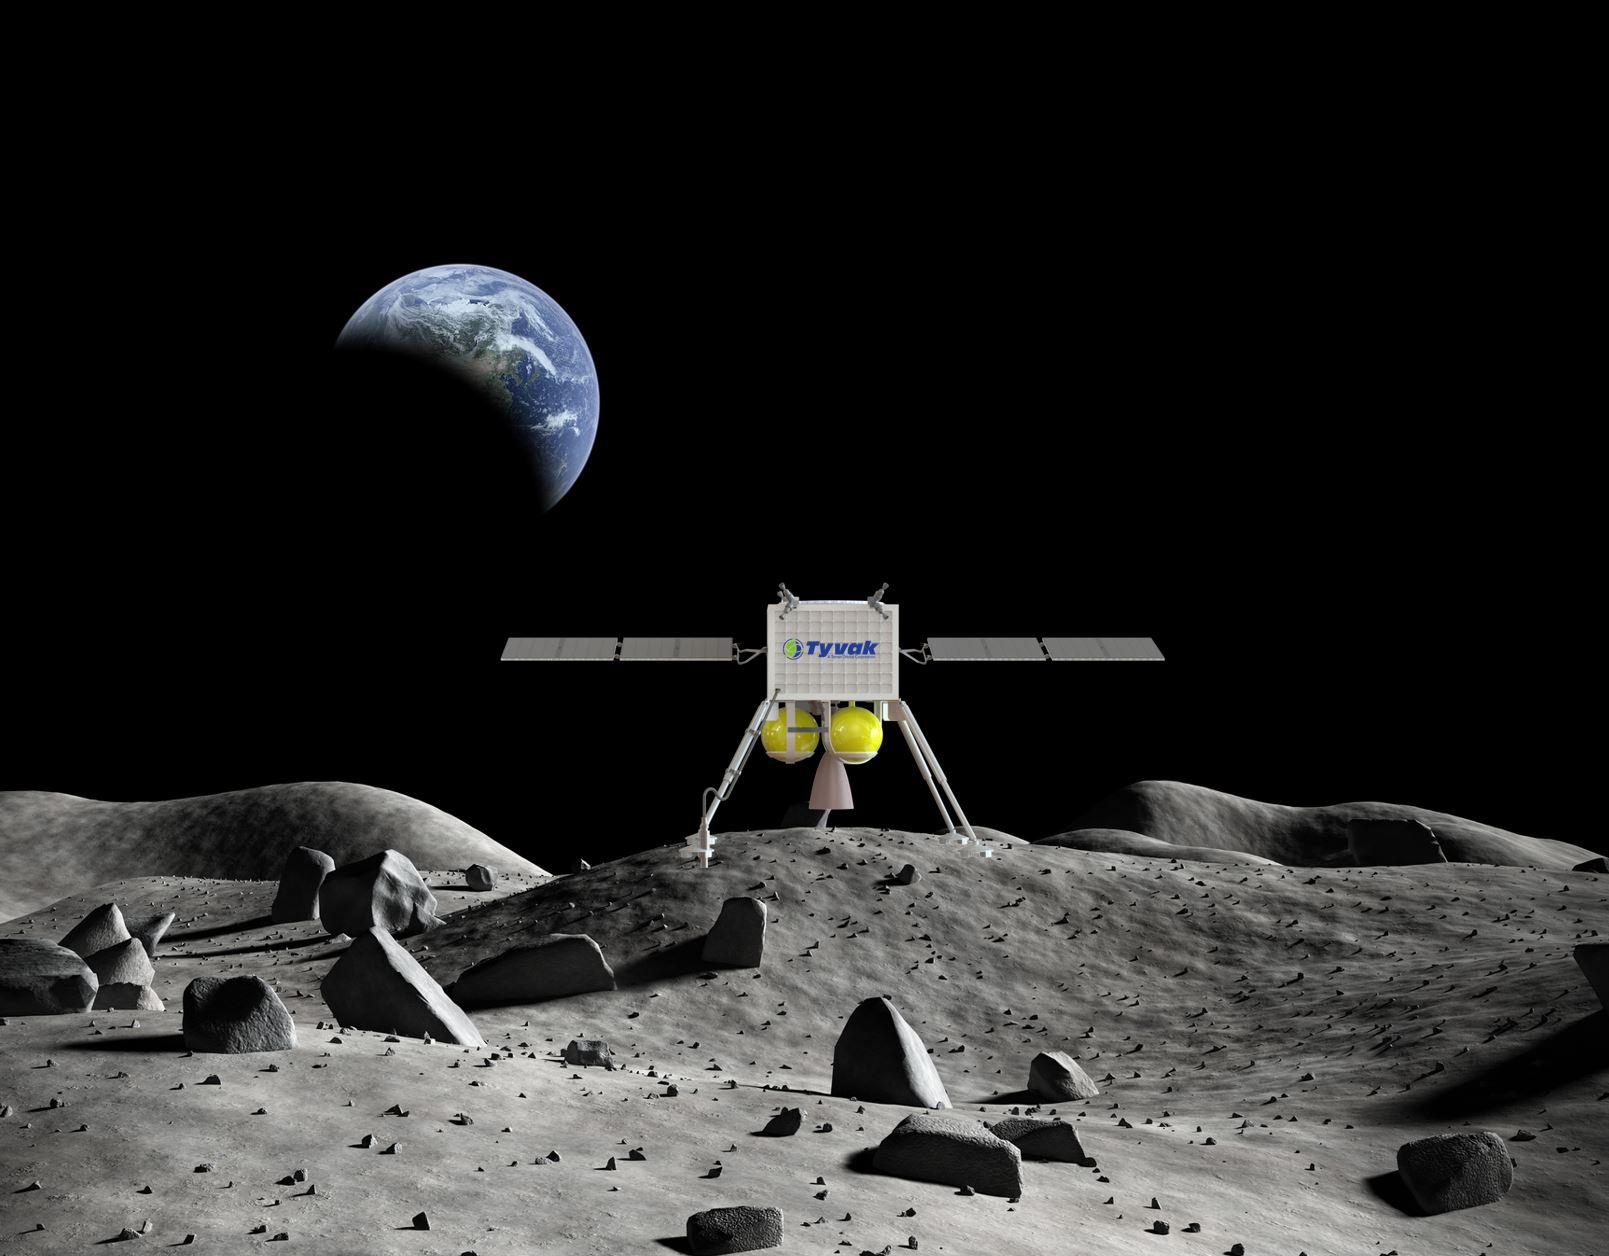 tyvak_clps_lunar_lander.jpeg